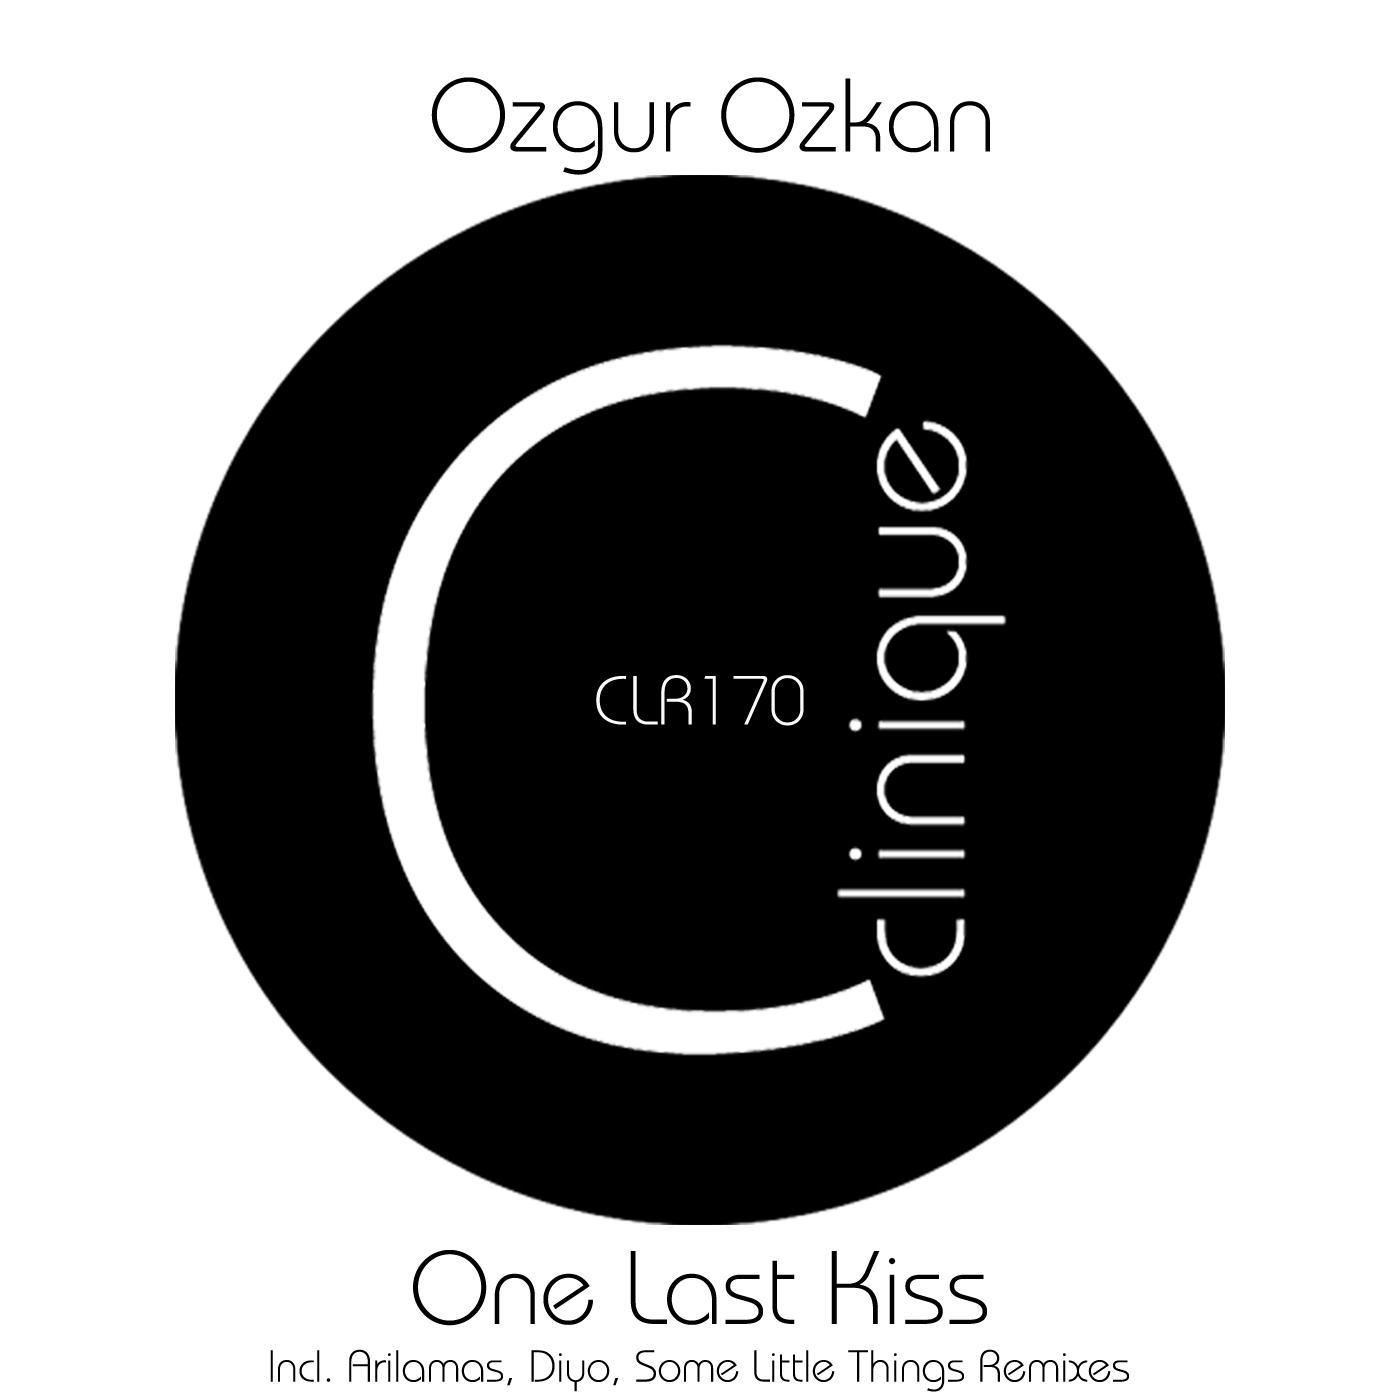 Ozgur Ozkan - One Last Kiss